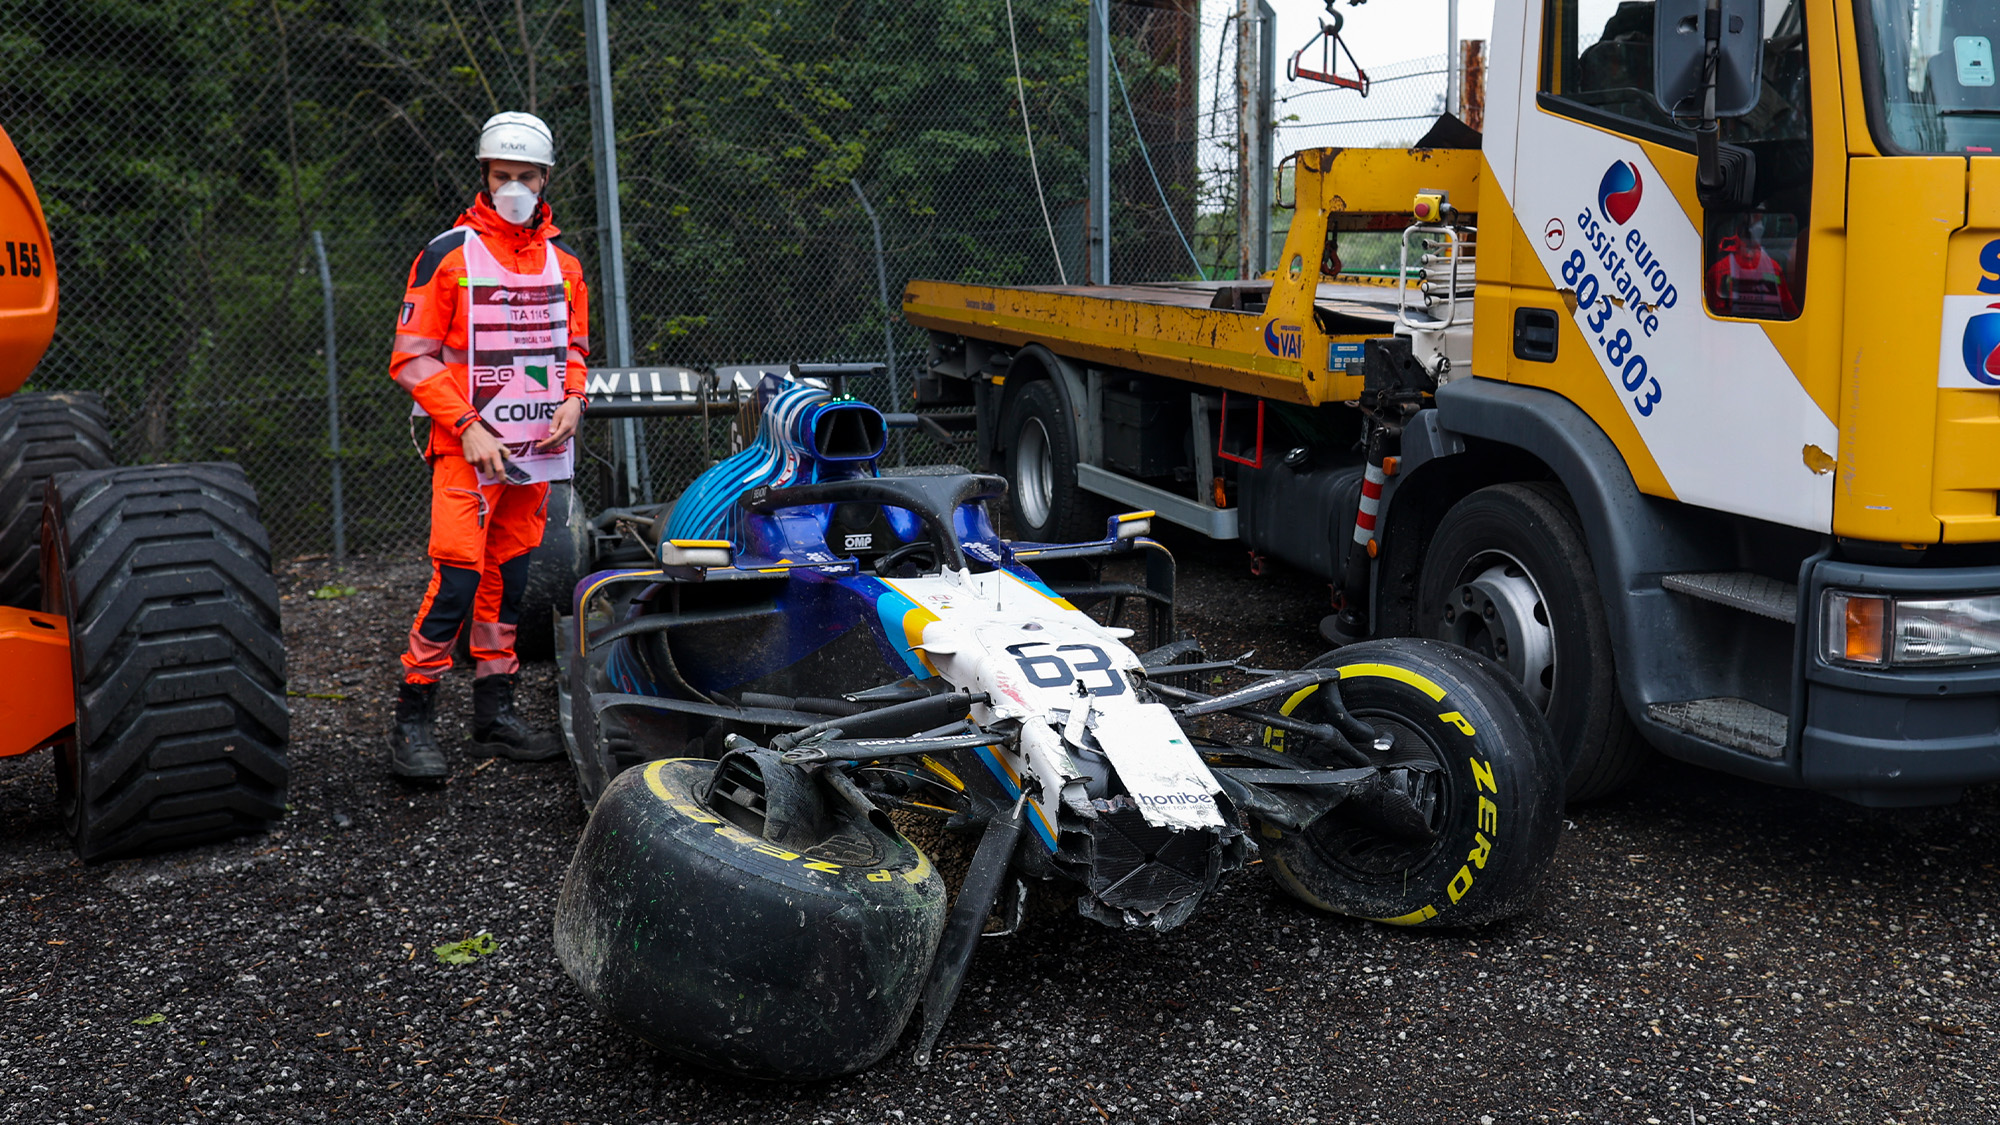 George Russell, 2021 Emilia Romagna GP